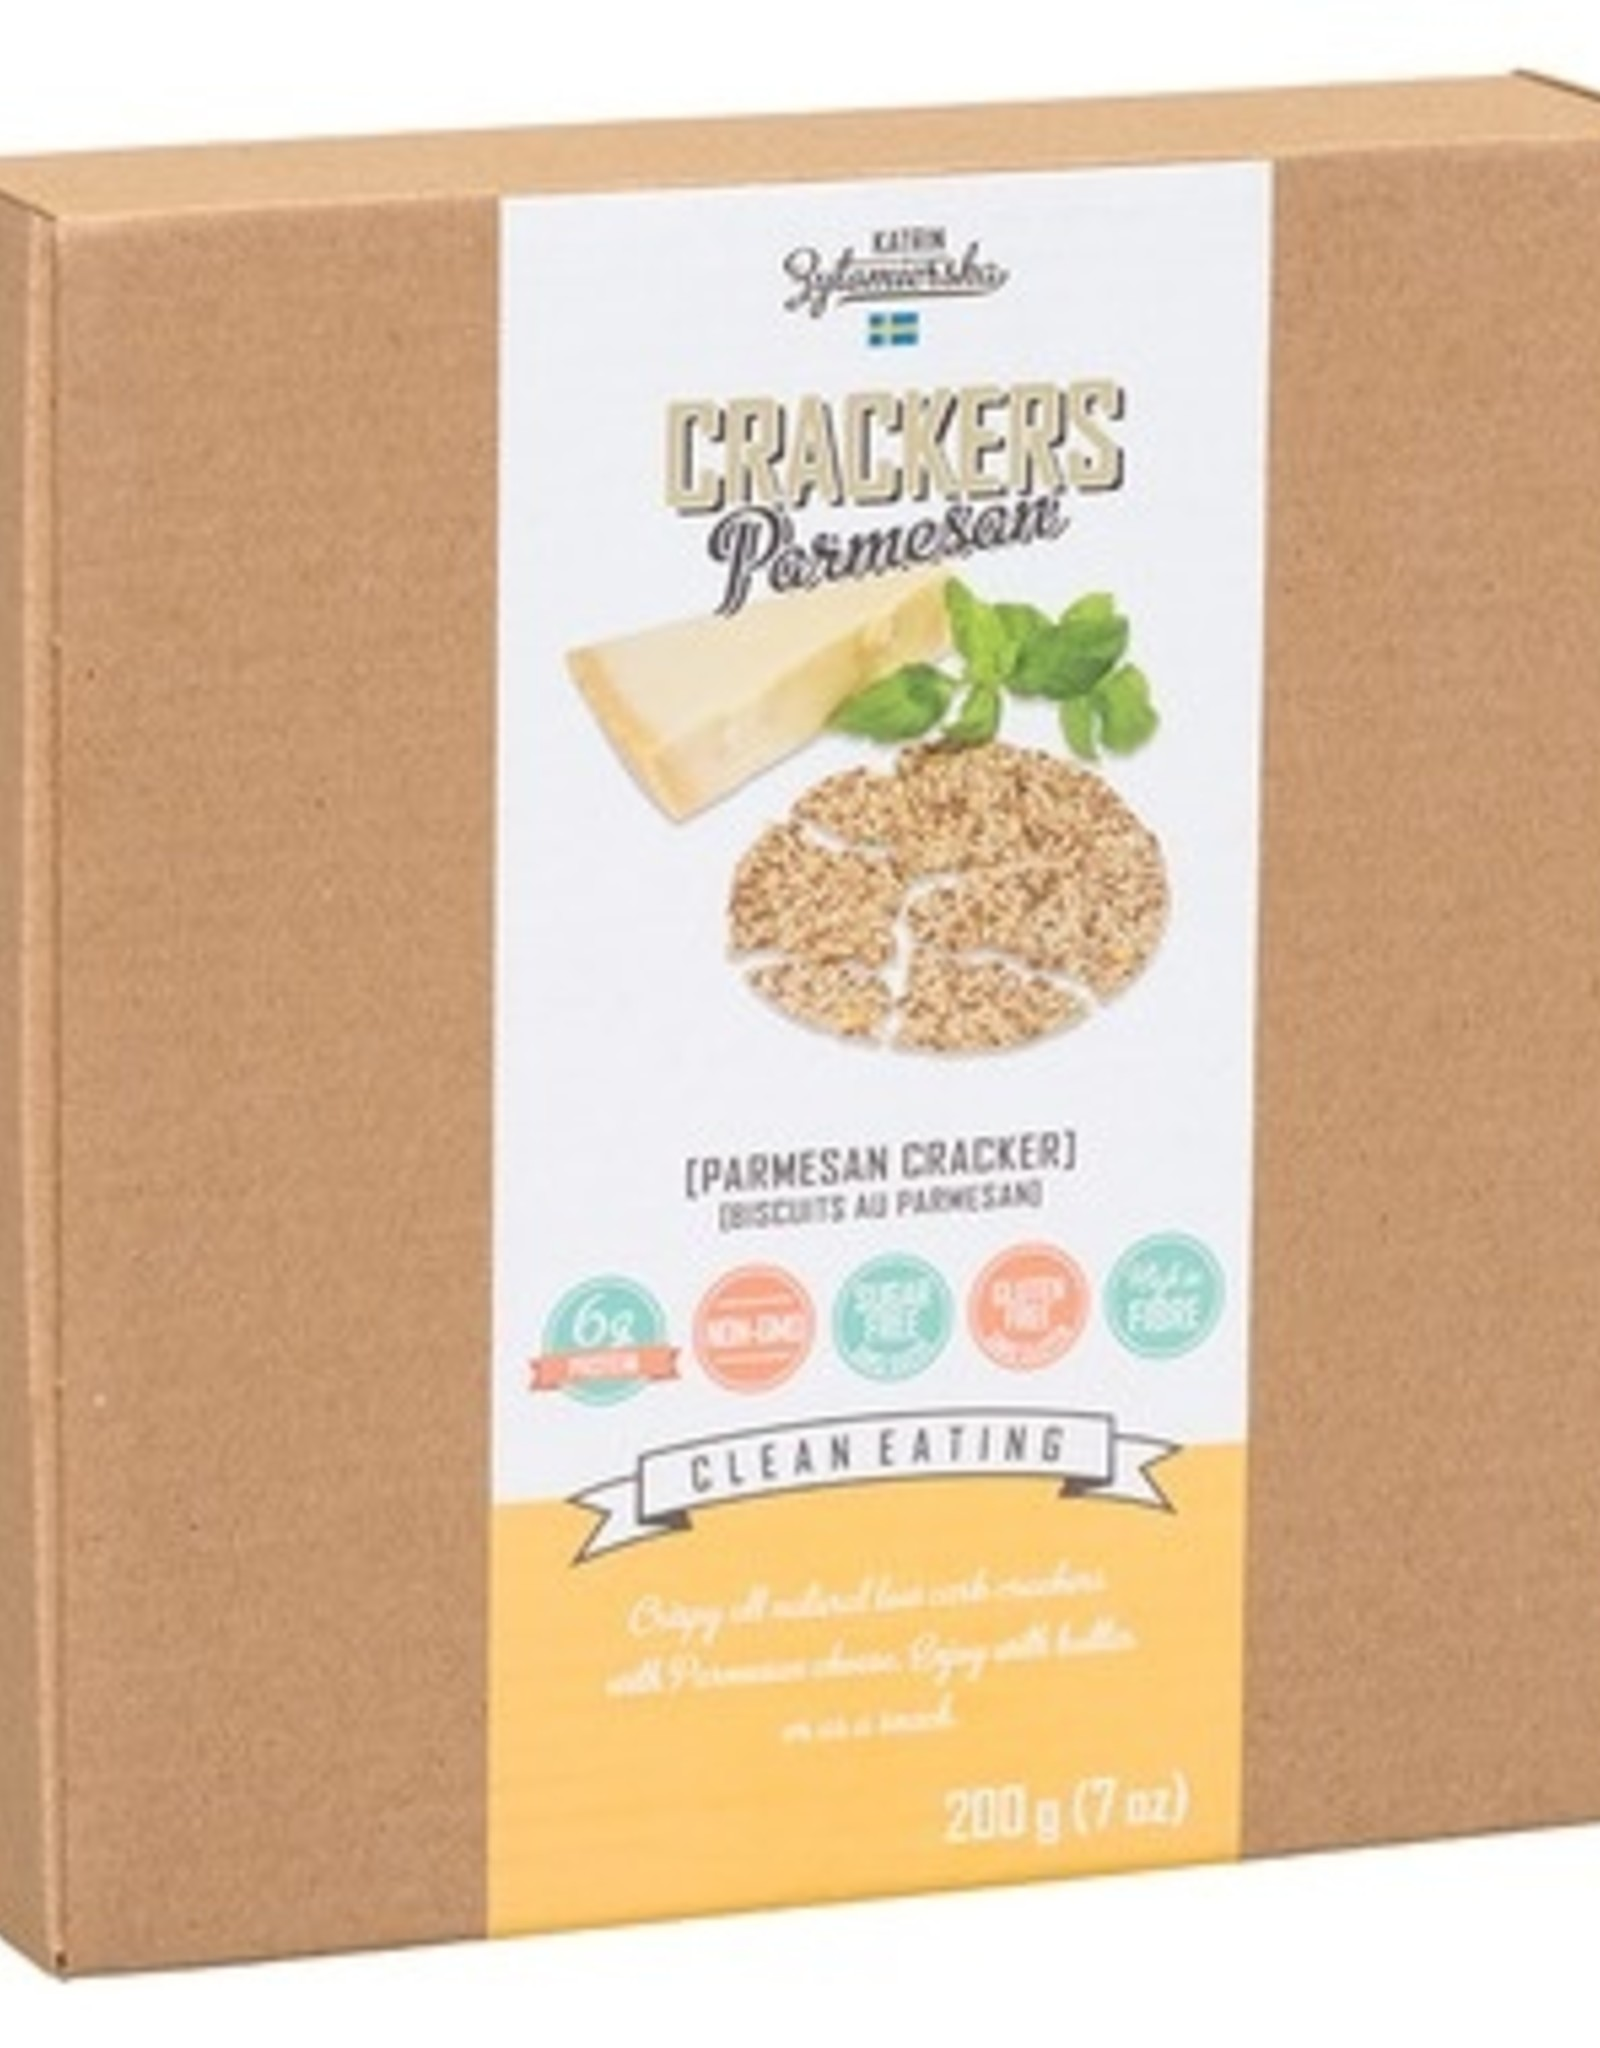 KZ Clean Eating Kz Clean Eating - Craquelins, Parmesan (200g)